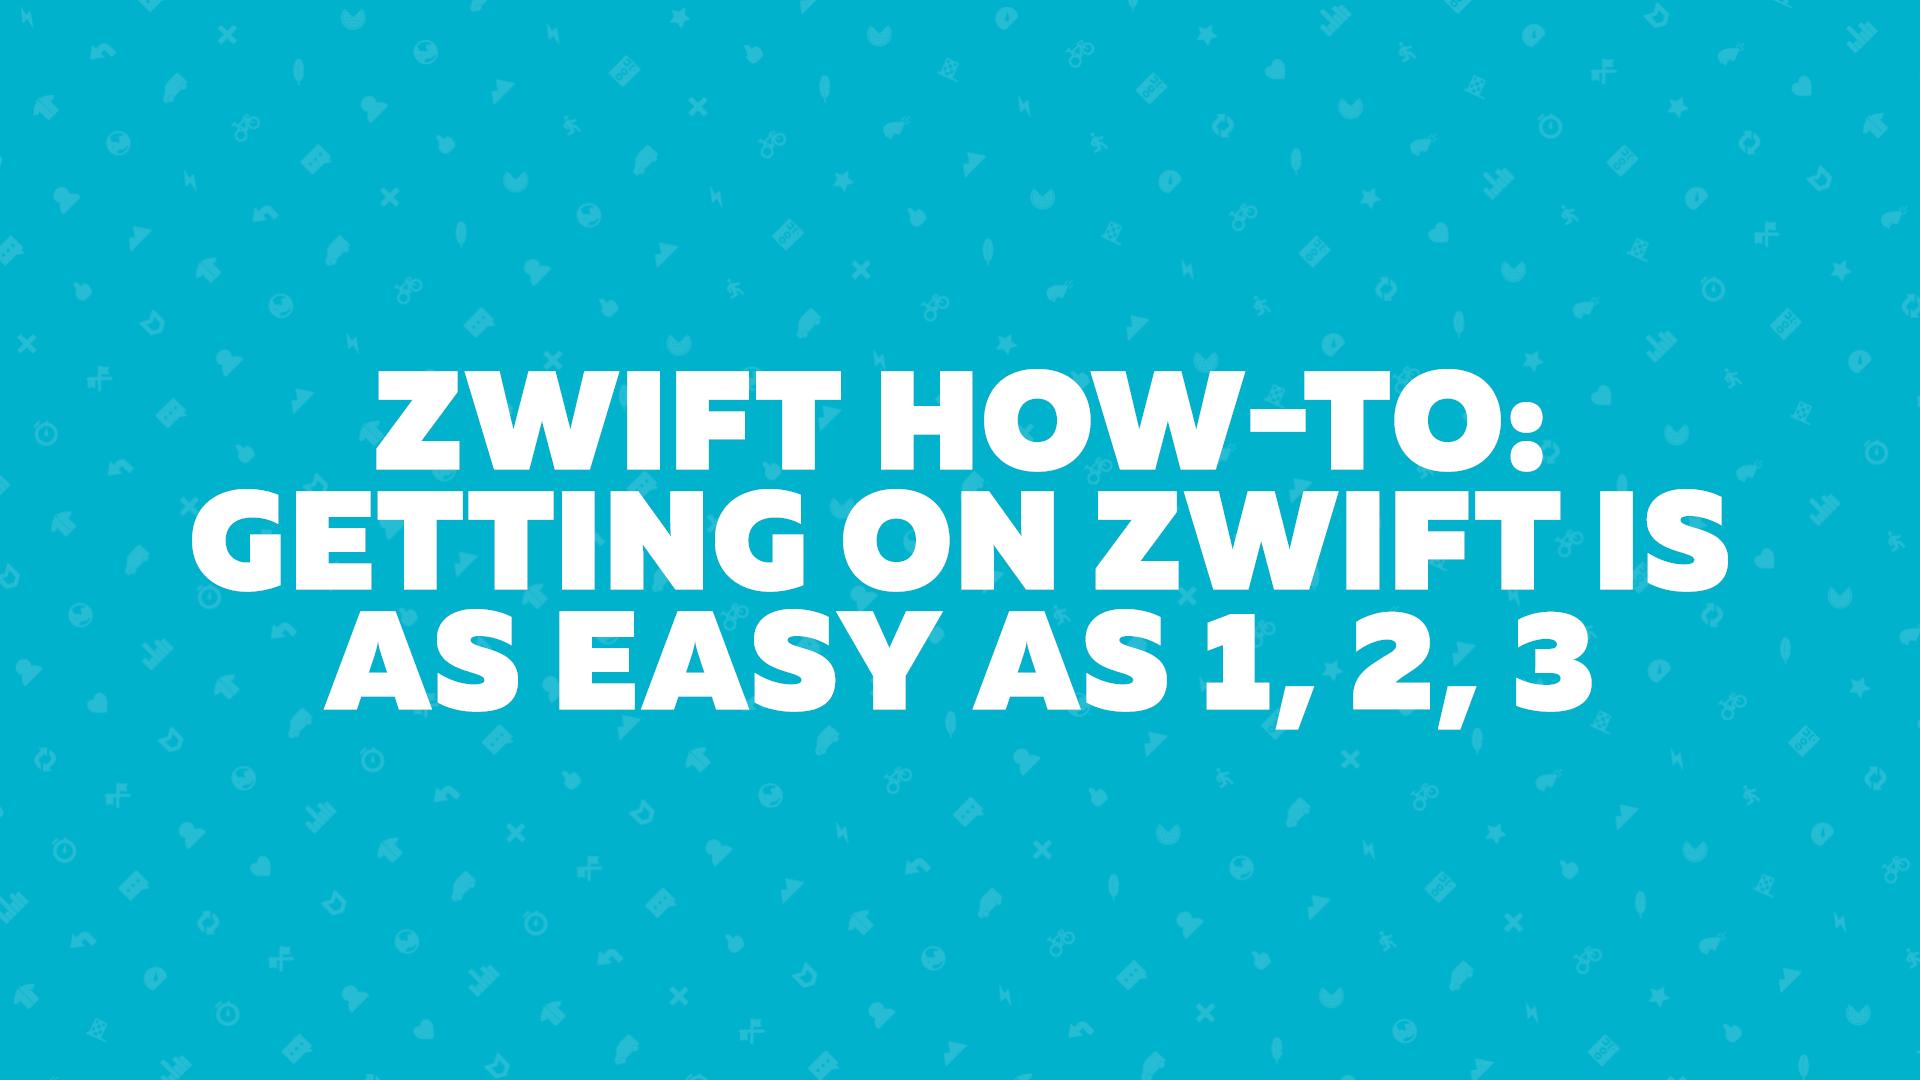 Getting on Zwift is as easy as 1, 2, 3 | Zwift